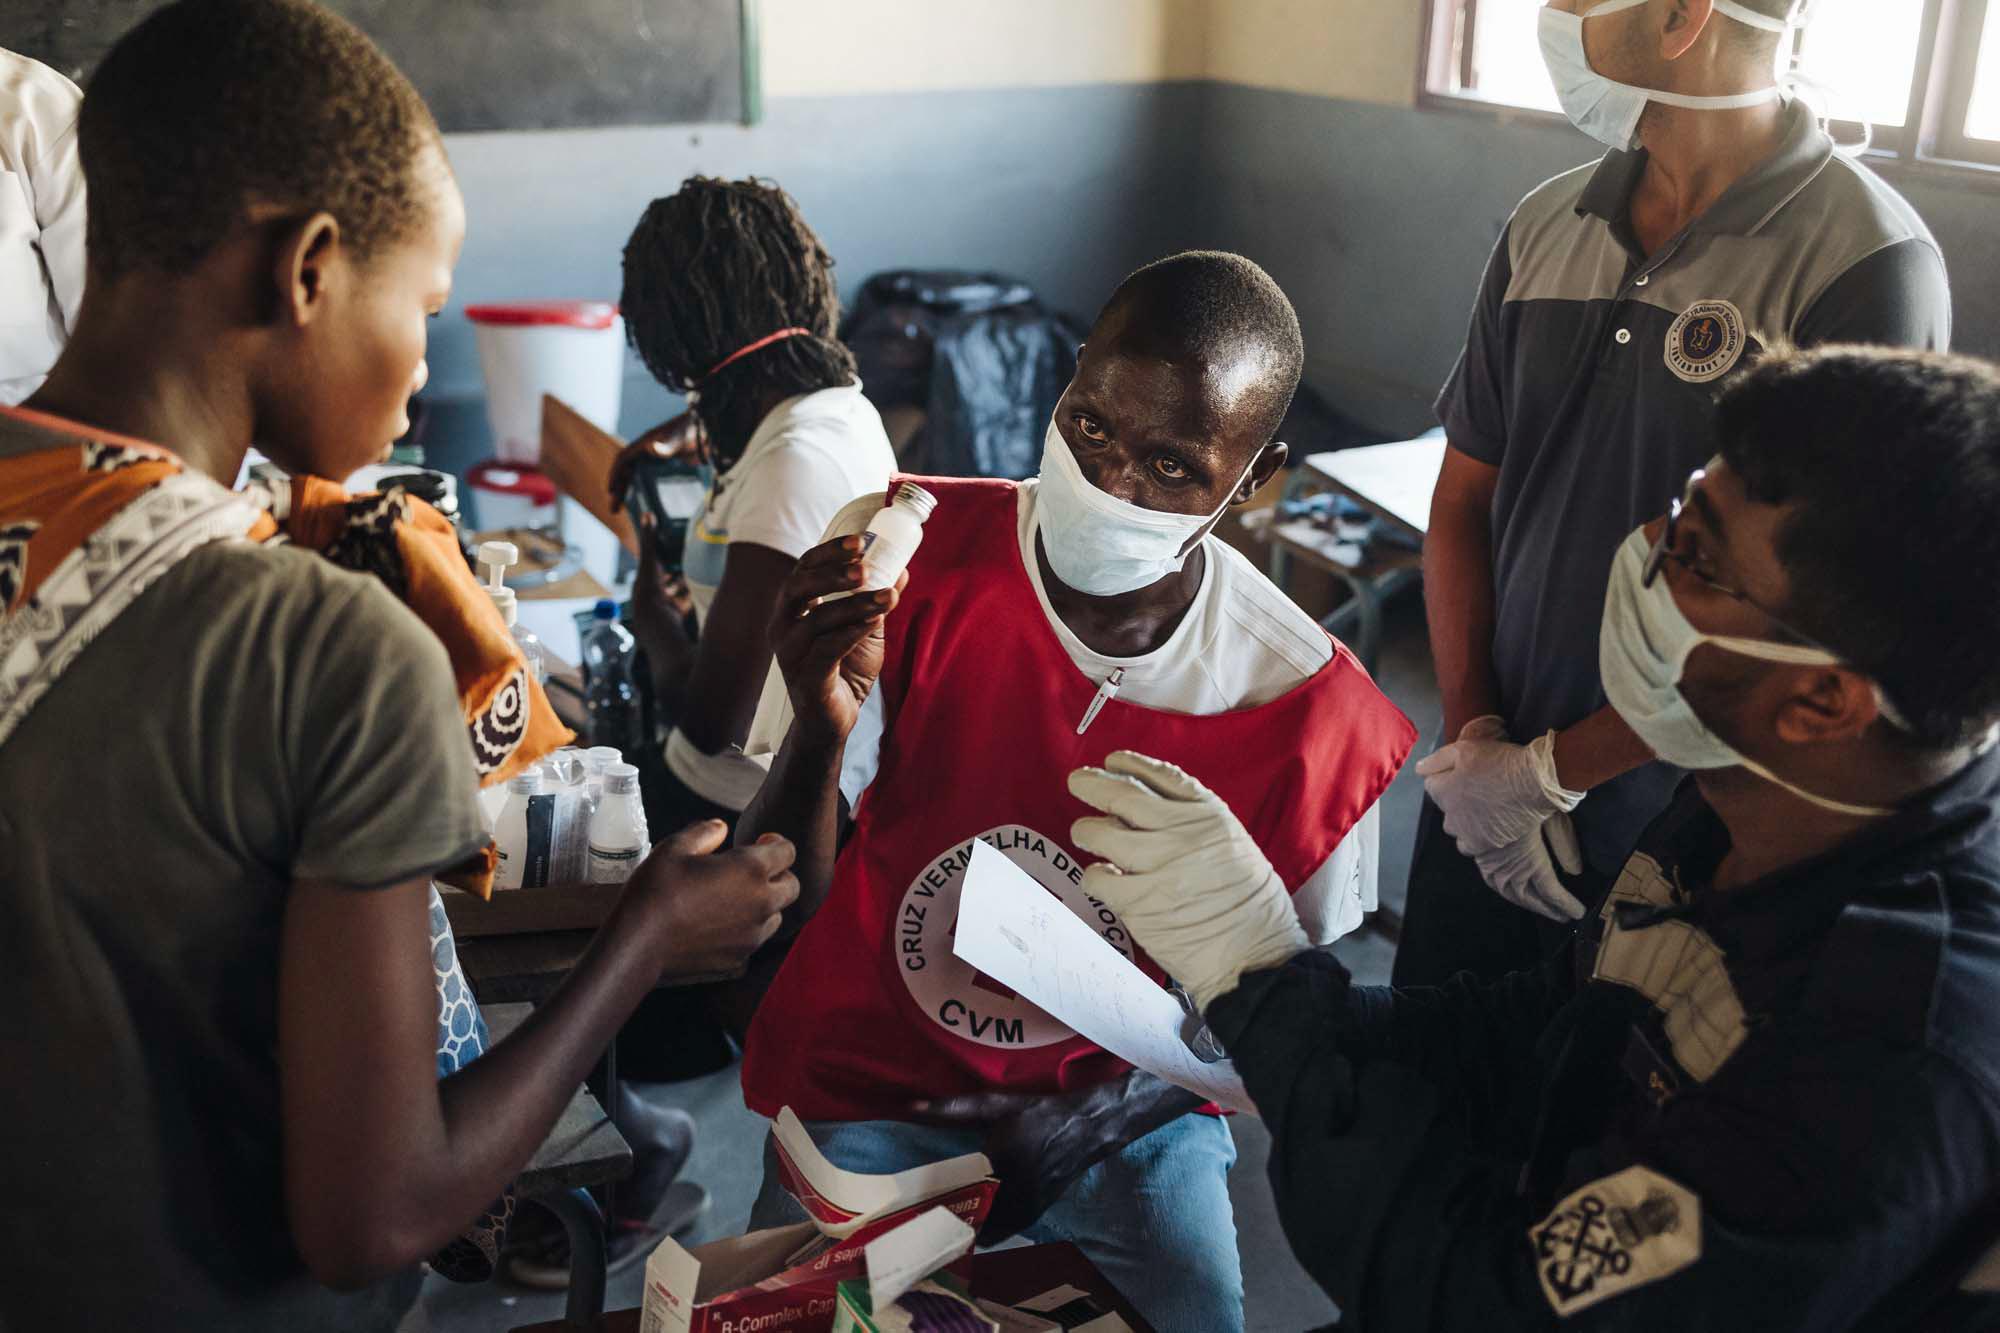 Mozambique Red Cross volunteer distributed medicine to beneficiaries at Matadoro evacuation center in Inhamizua village, Beira. Beira, Mozambique / 25.03.2019